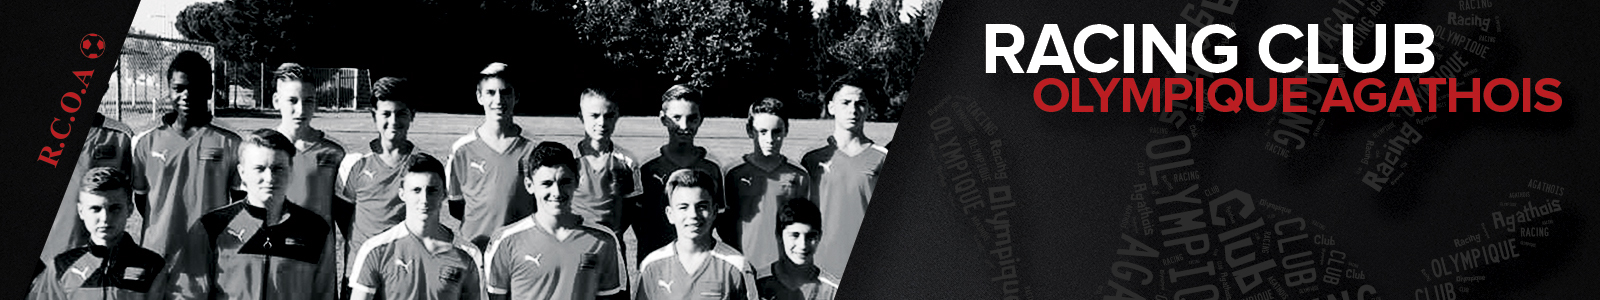 RACING CLUB OLYMPIQUE AGATHOIS : site officiel du club de foot de AGDE - footeo